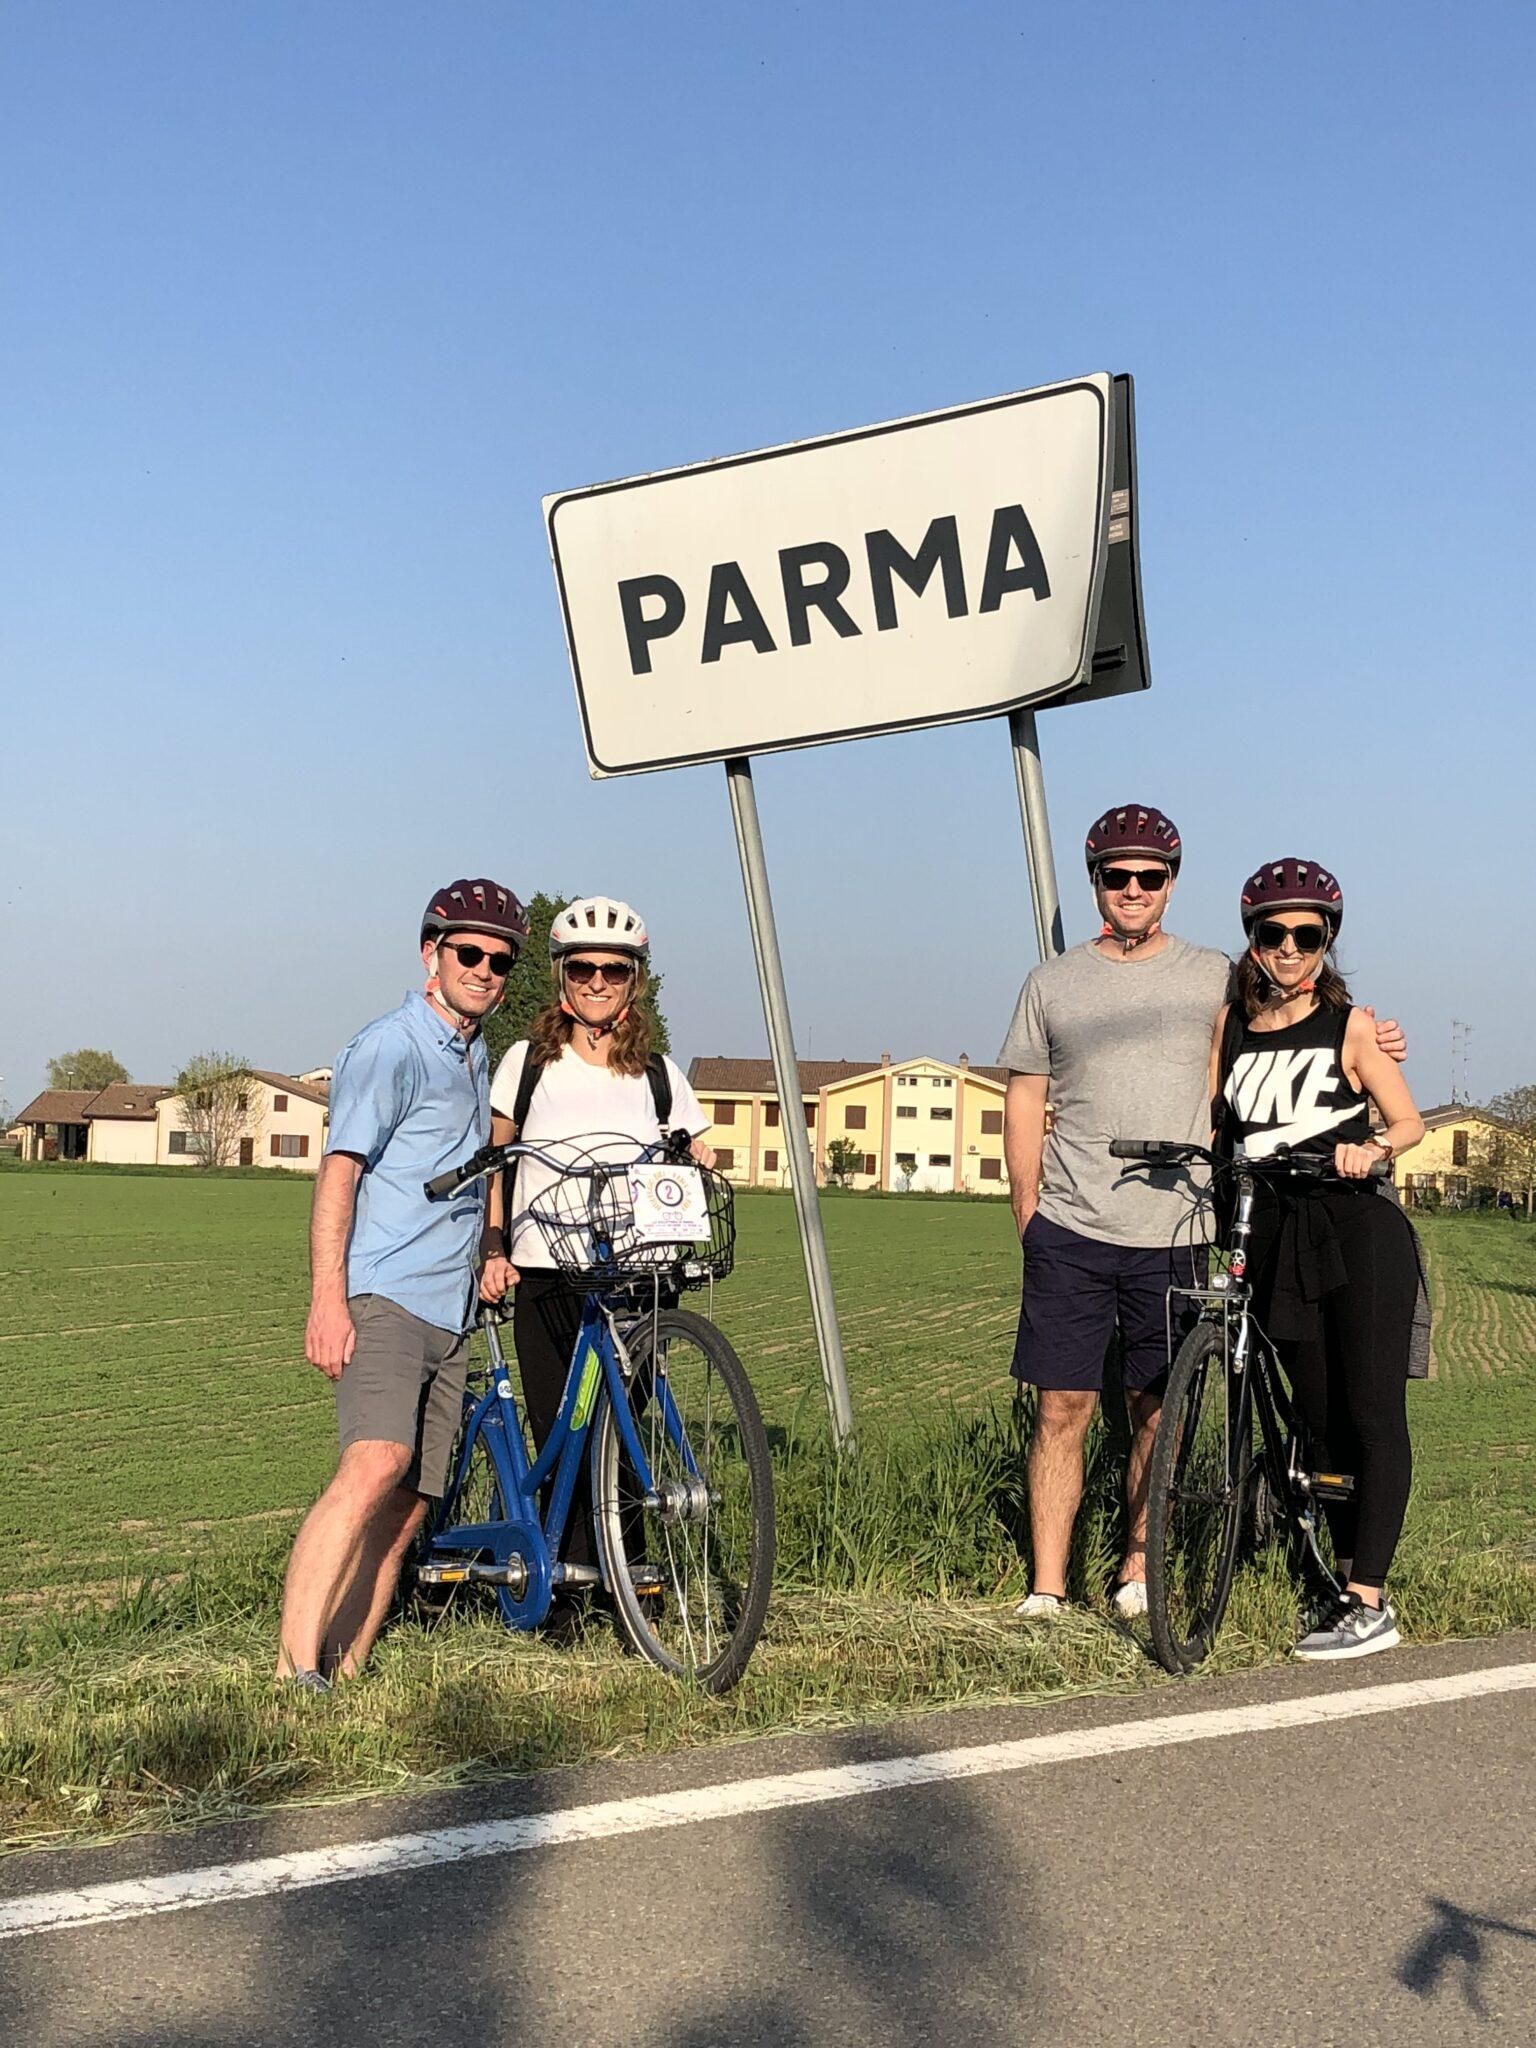 Food Tour Italy   Parma, Italy   Cobalt Chronicles   Washington, DC Travel Blogger